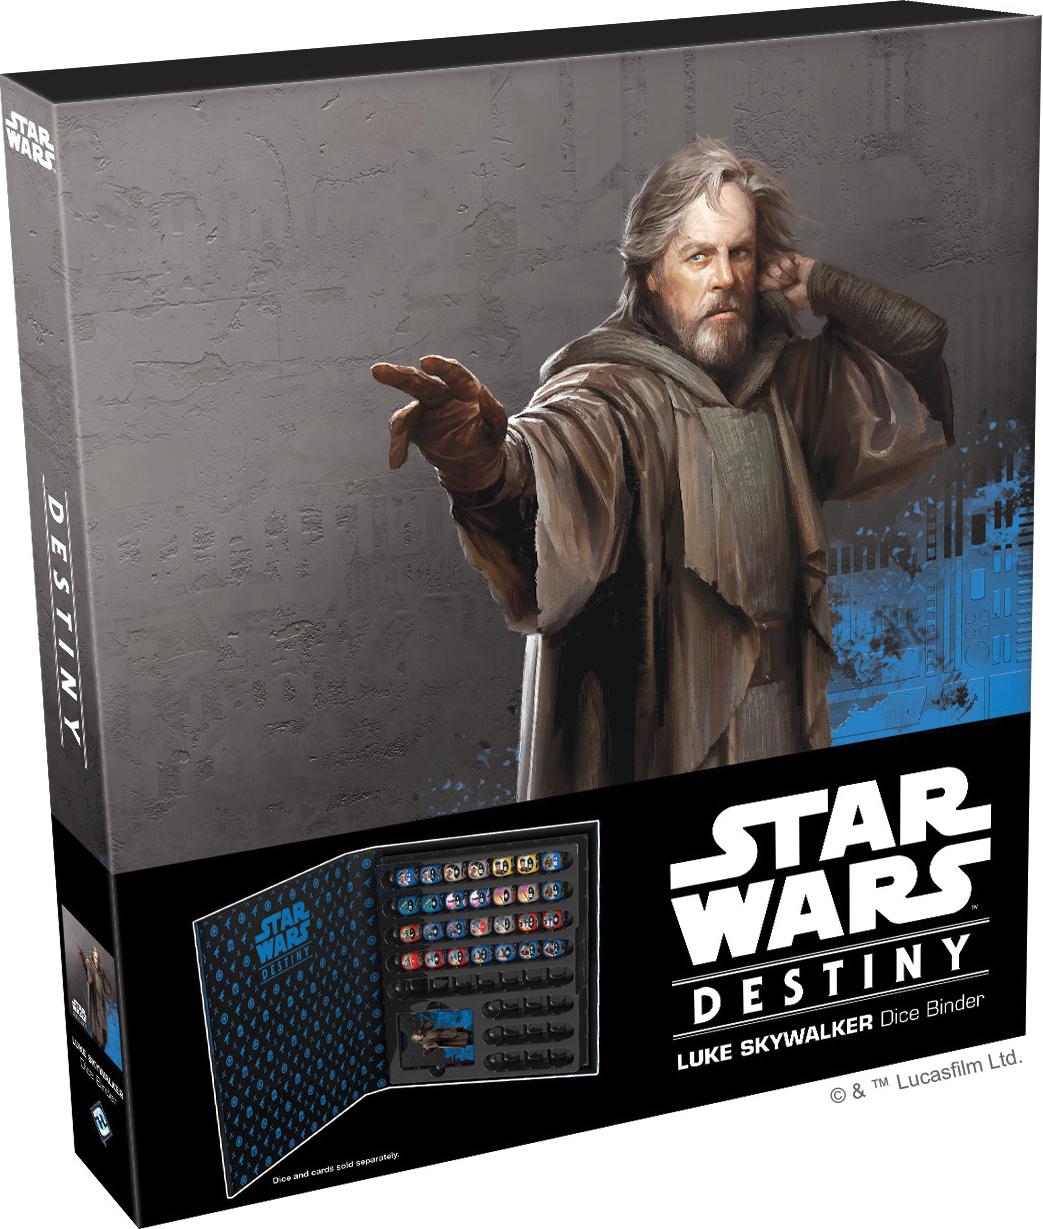 Star Wars Destiny: Luke Skywalker Dice Binder Box Front